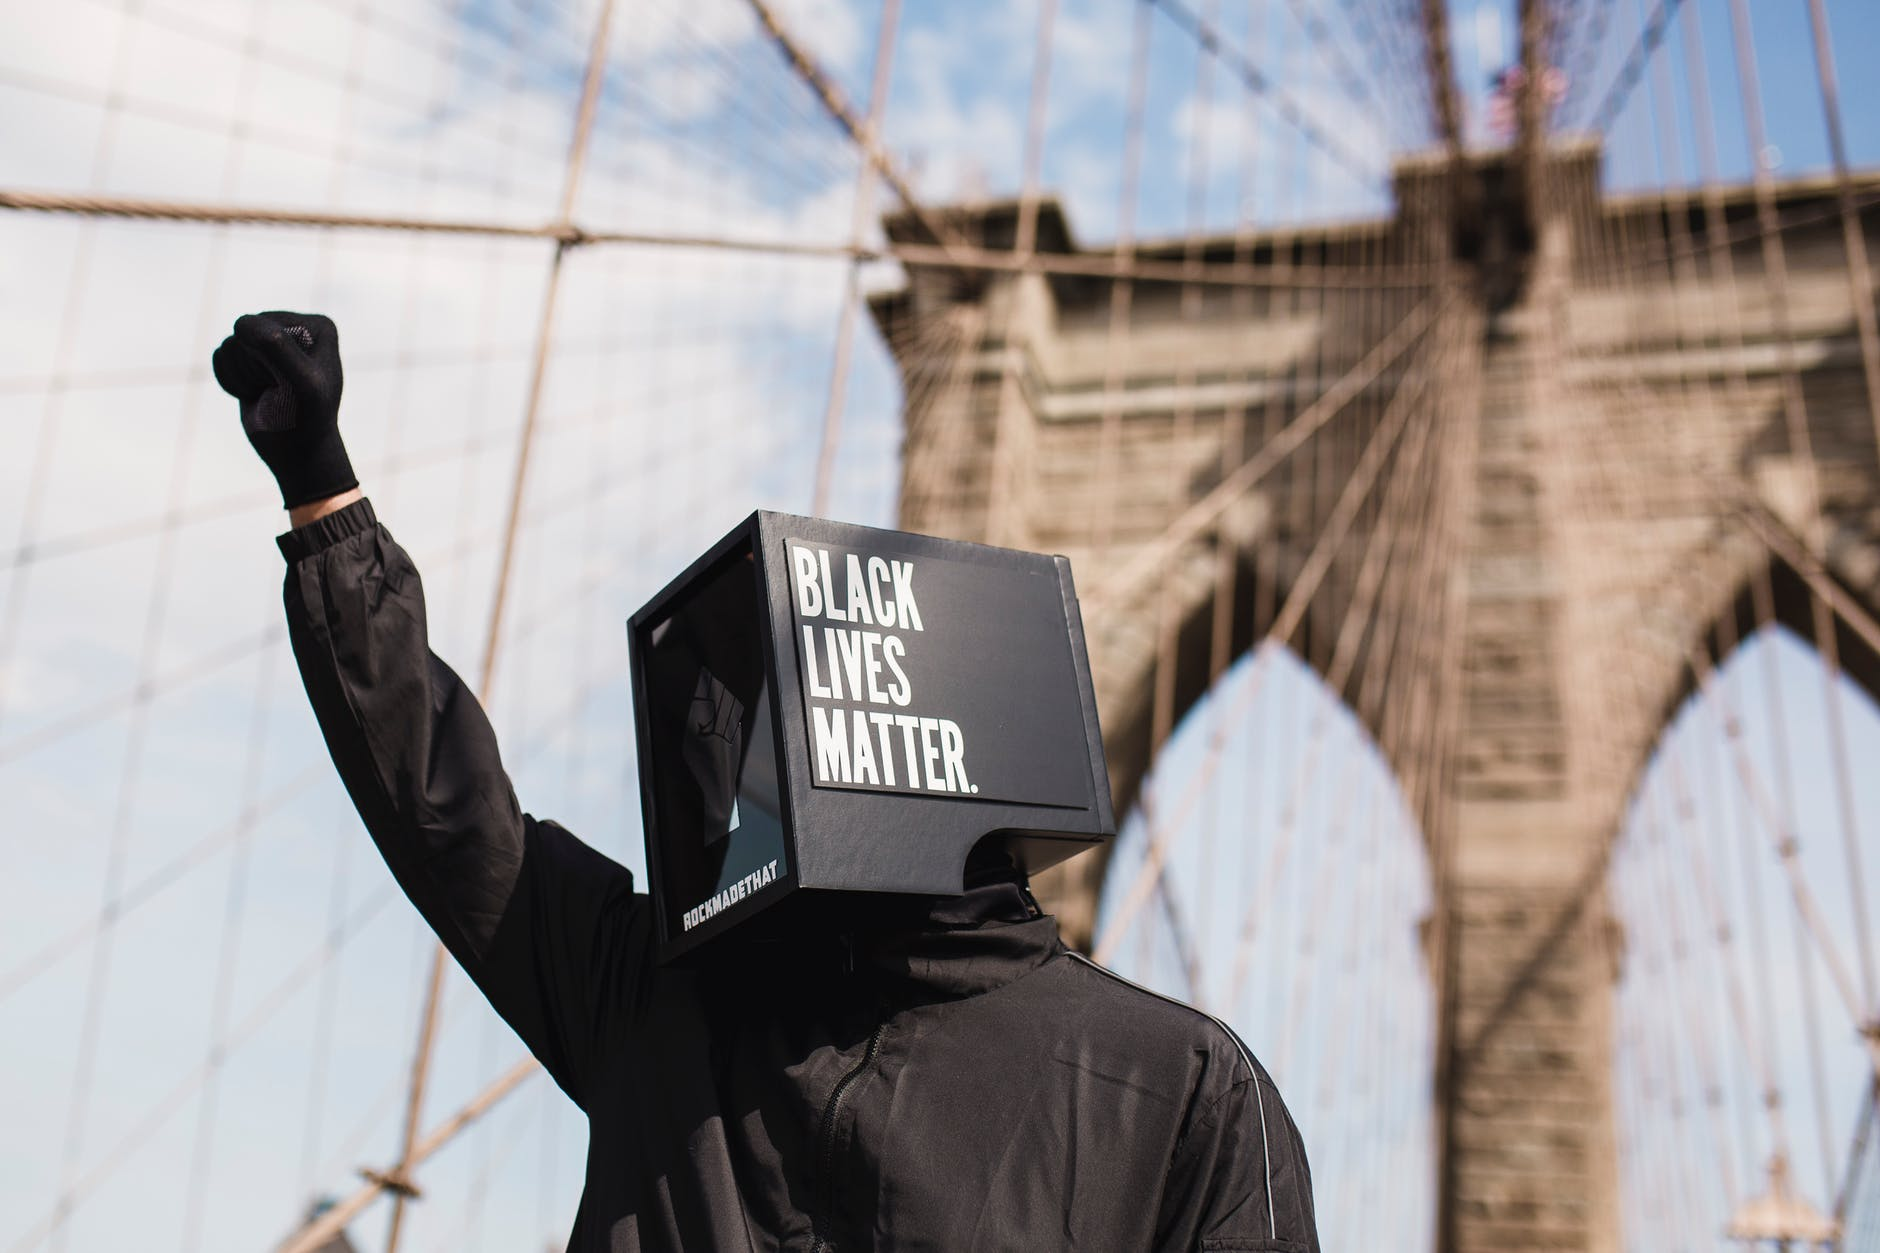 Black Lives Matter: come si può ridiscutere le serie tv